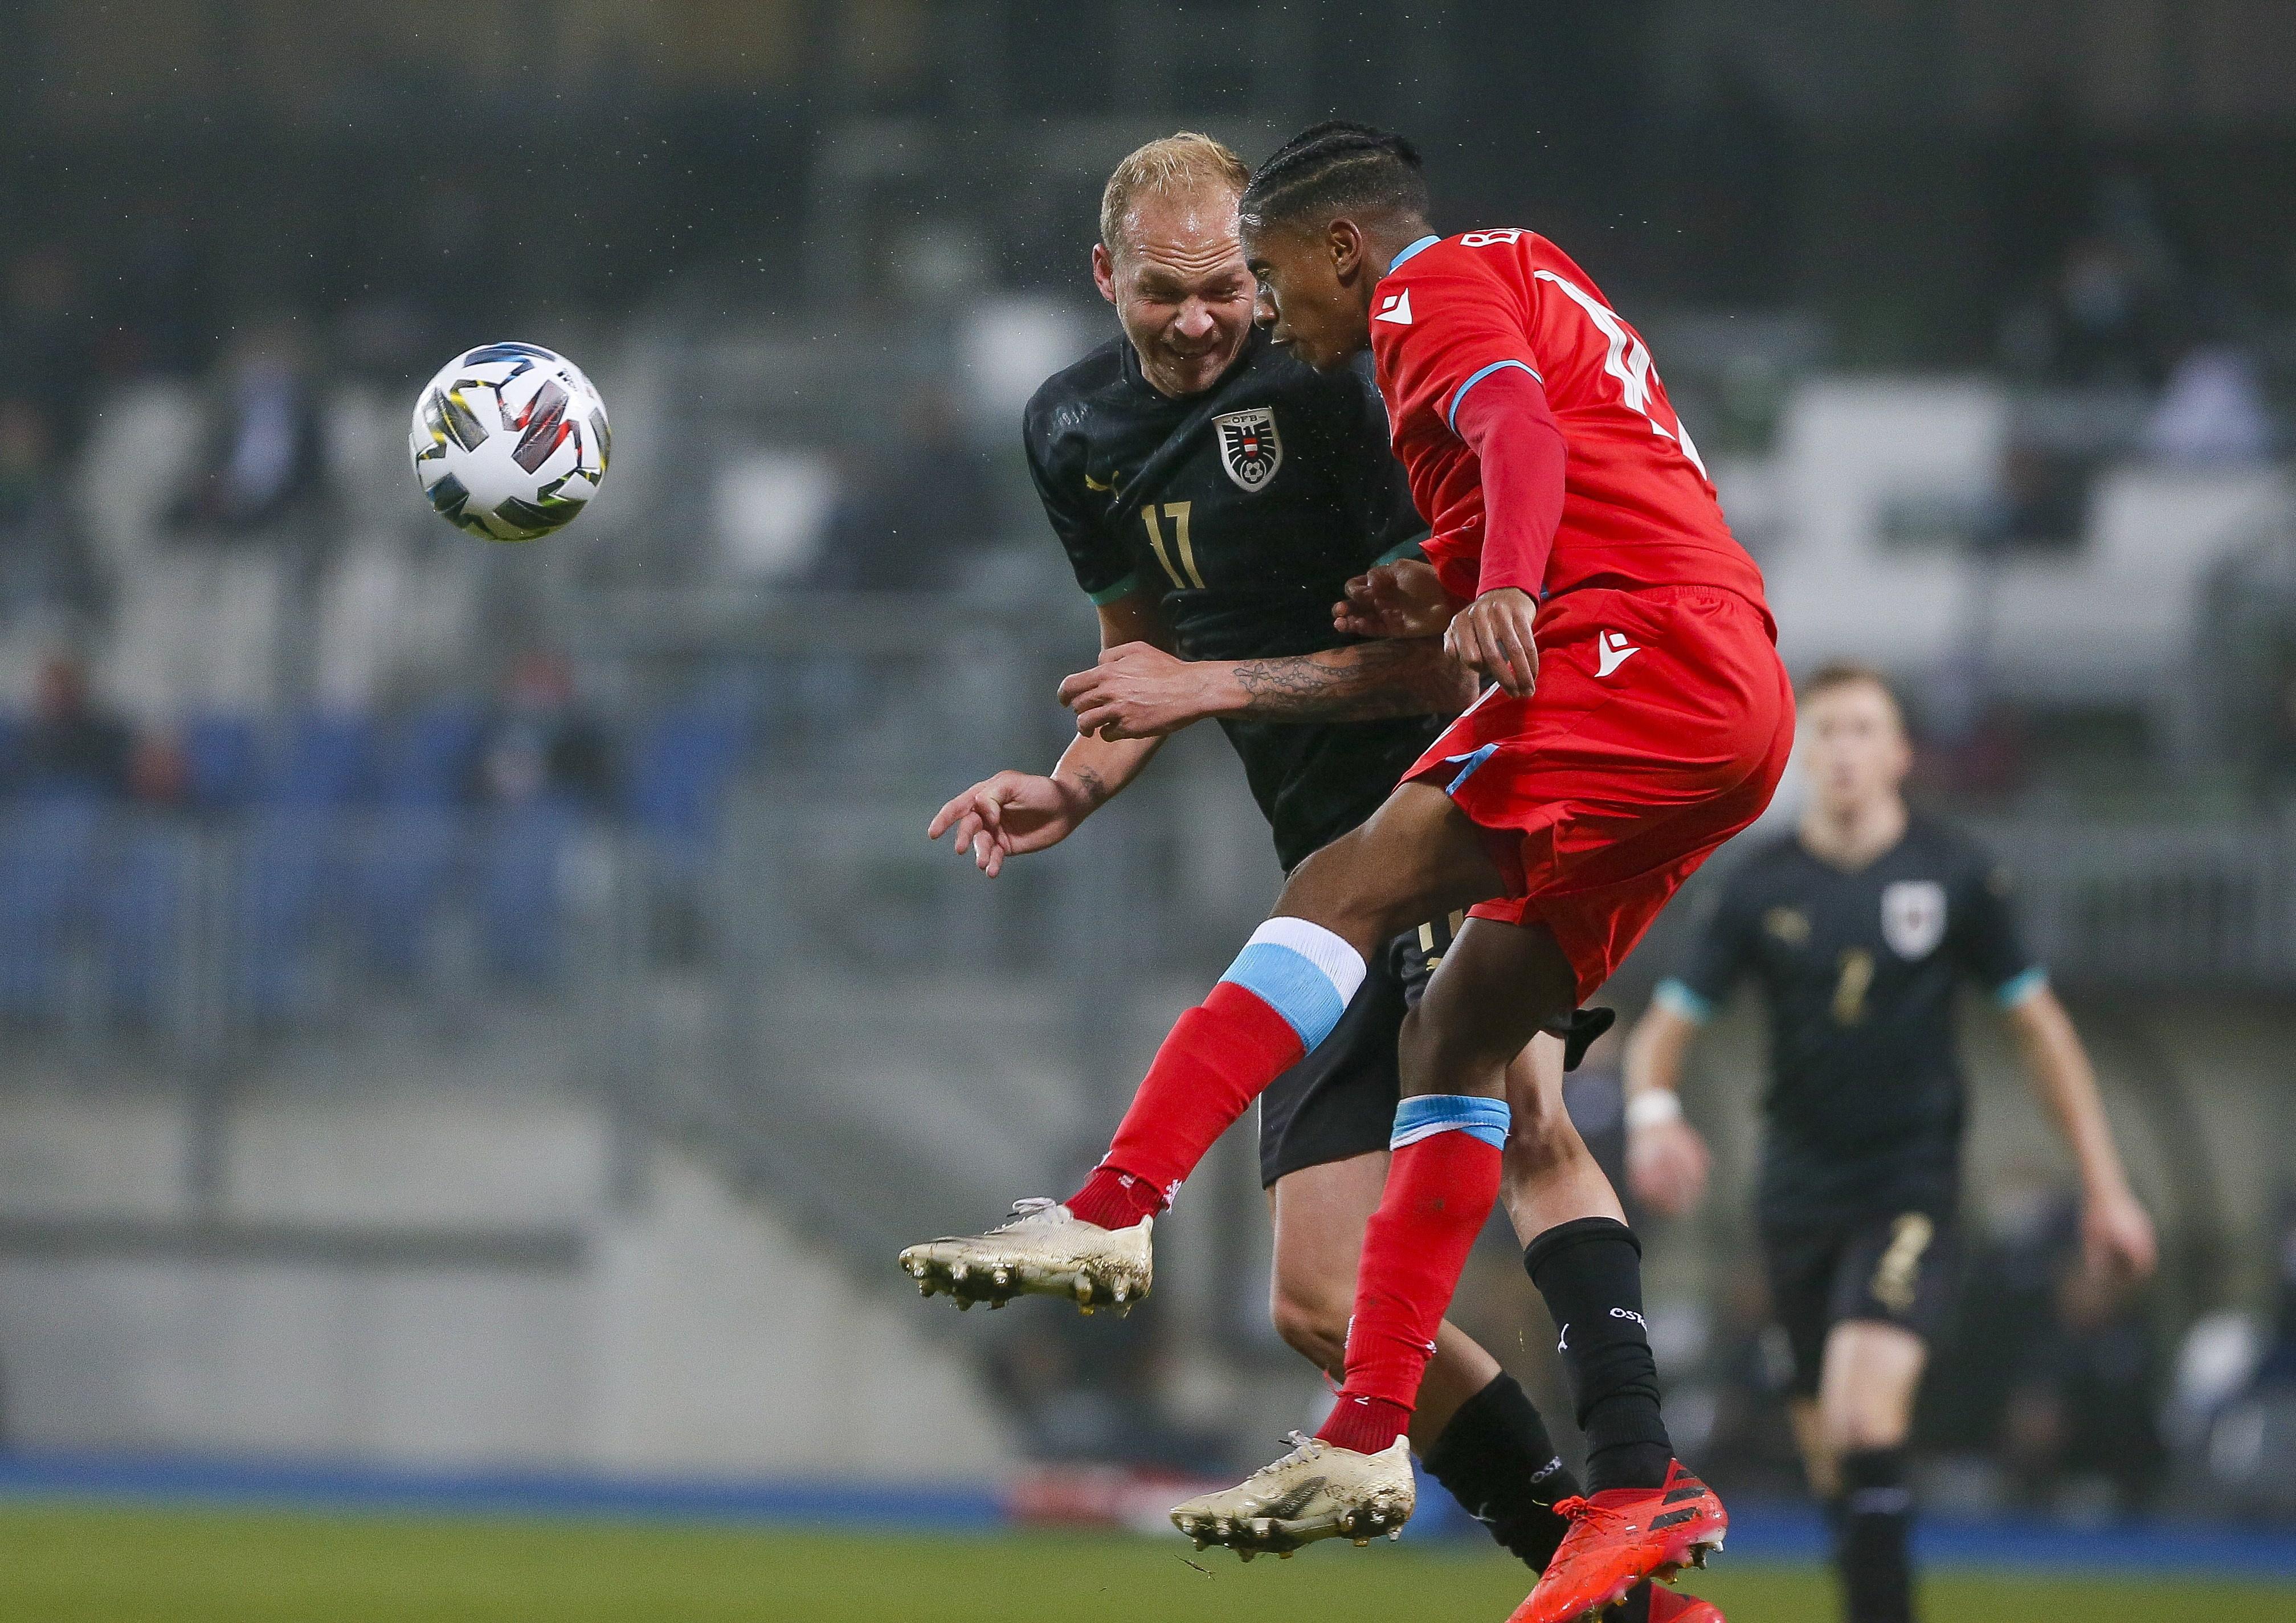 ÖFB-Teamspieler Holzhauser verlängerte Vertrag bei Beerschot